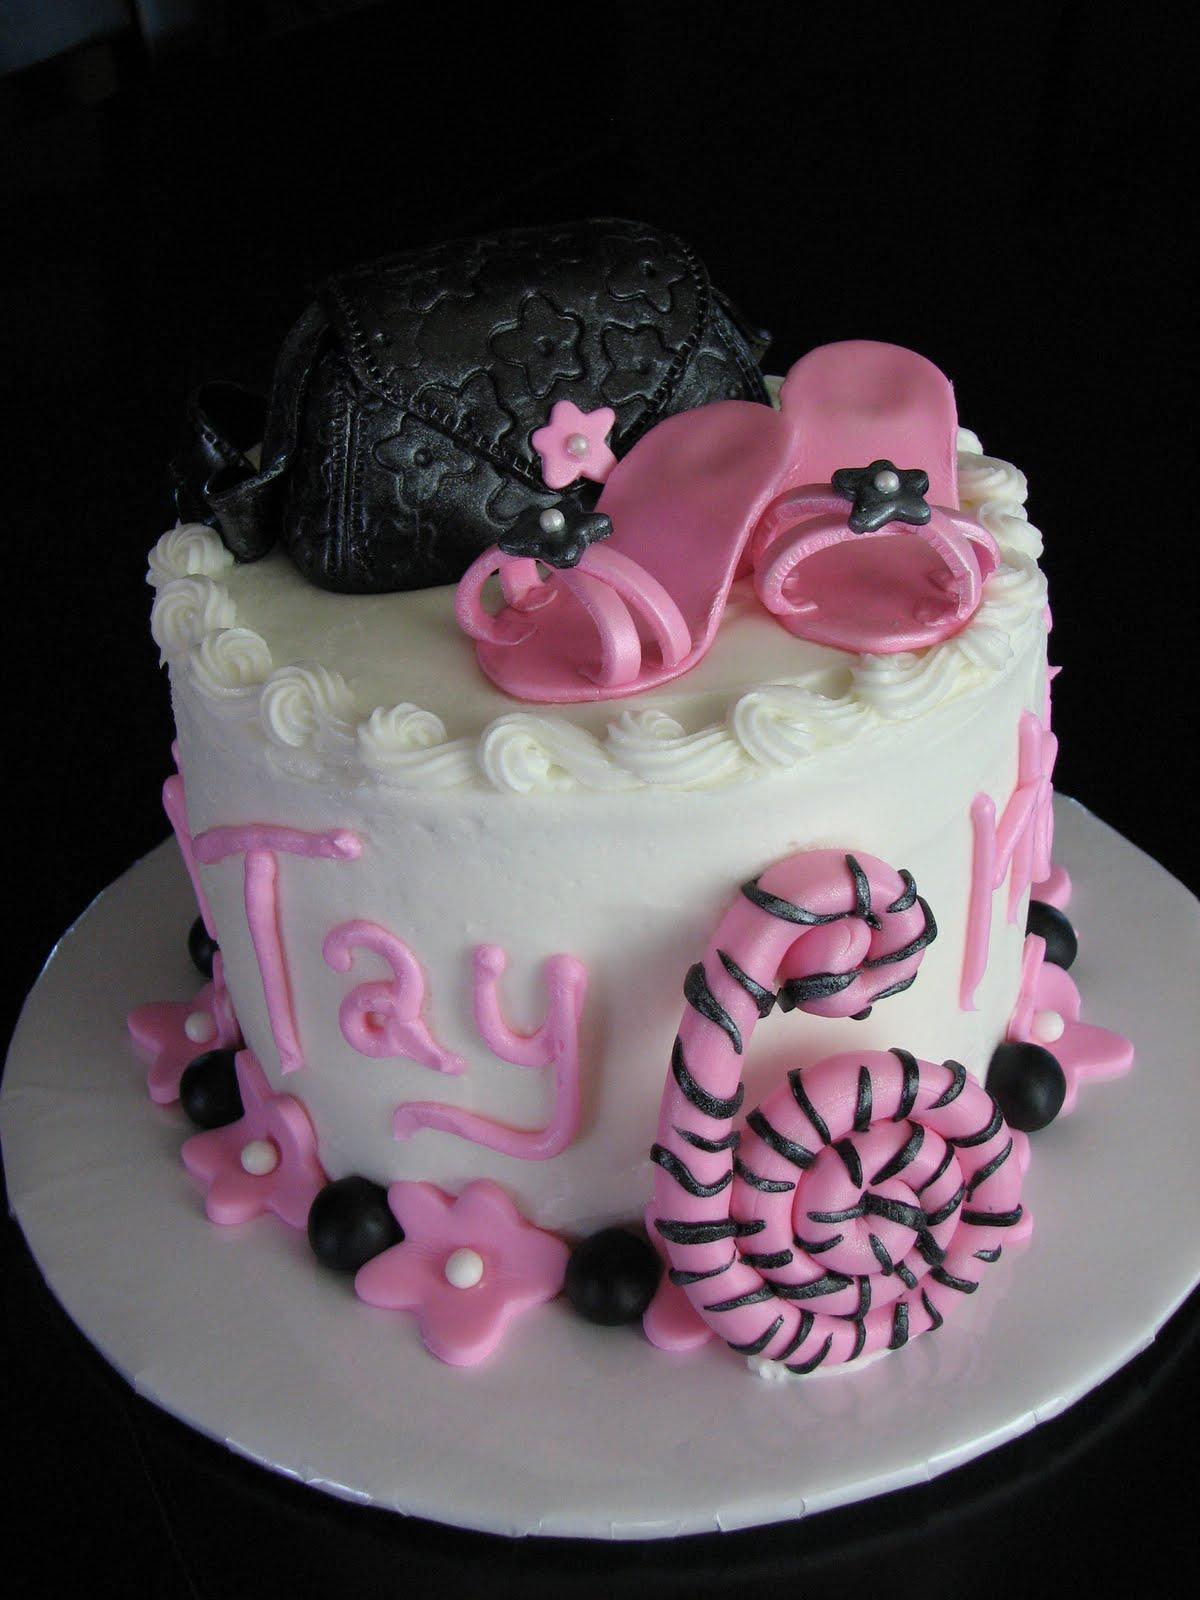 Decadent Designs Pink And Black Diva Birthday Cake